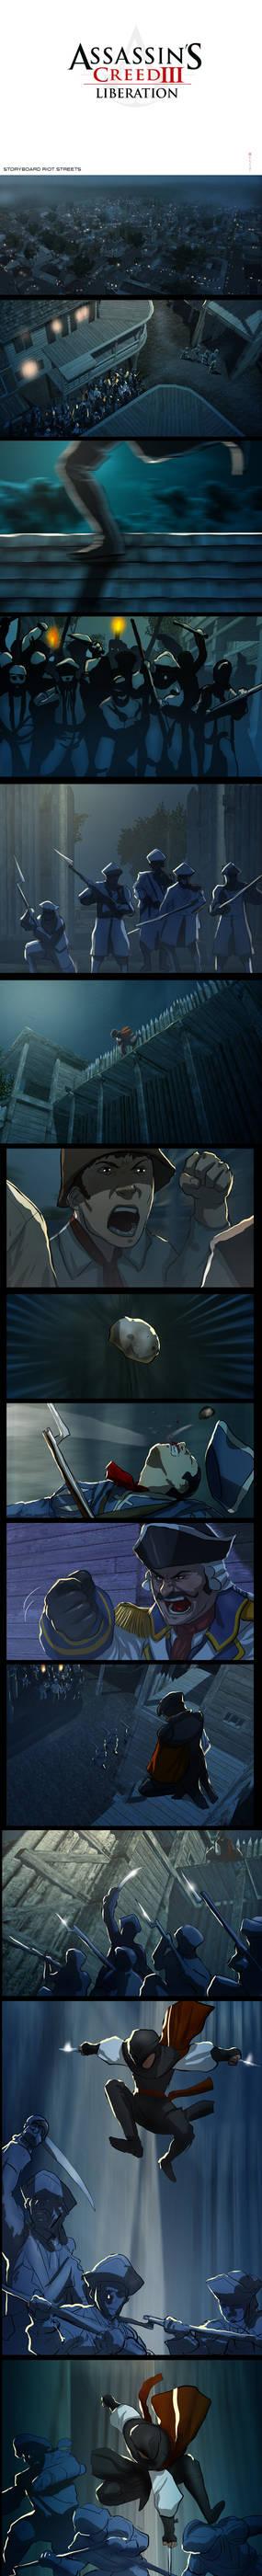 ACIII Liberation Storyboard Riots